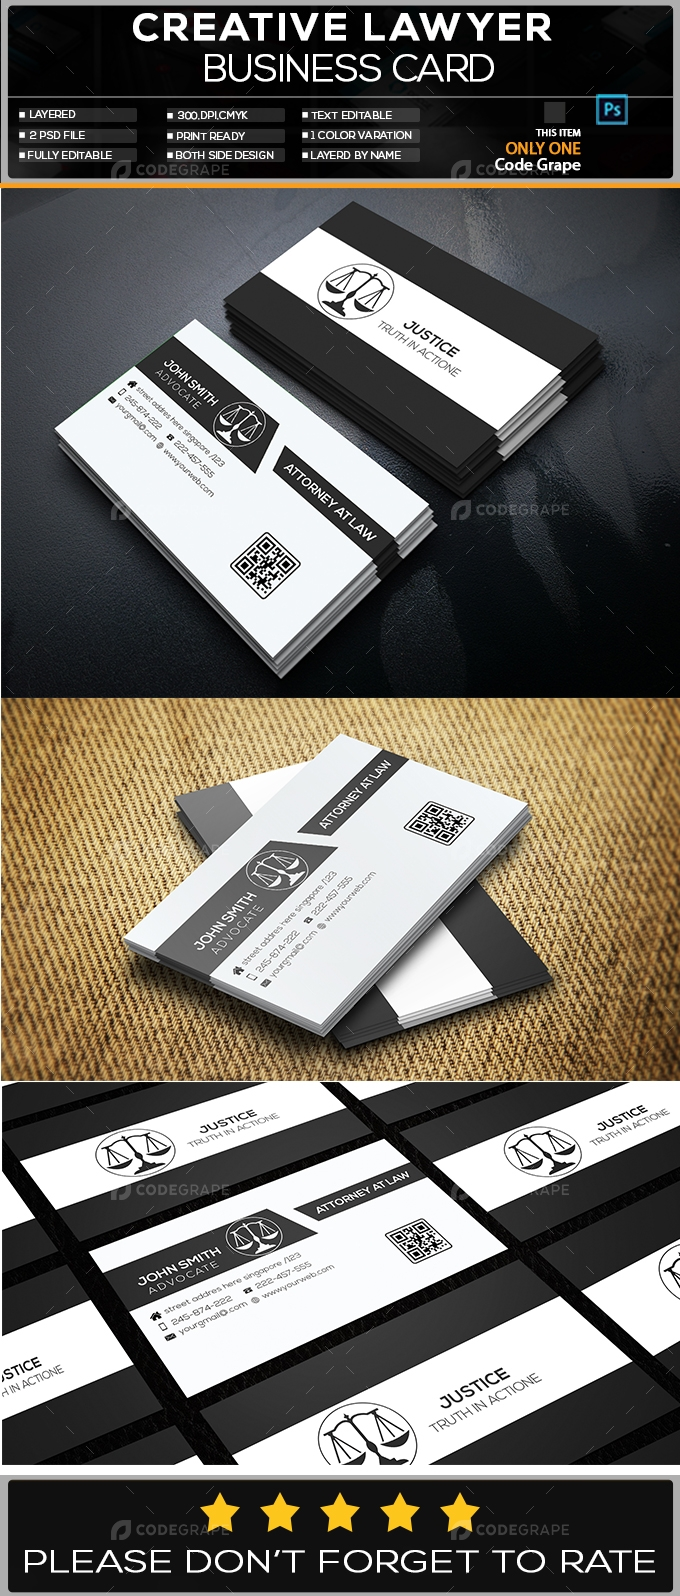 Creative Lawyer Business Card Print Codegrape